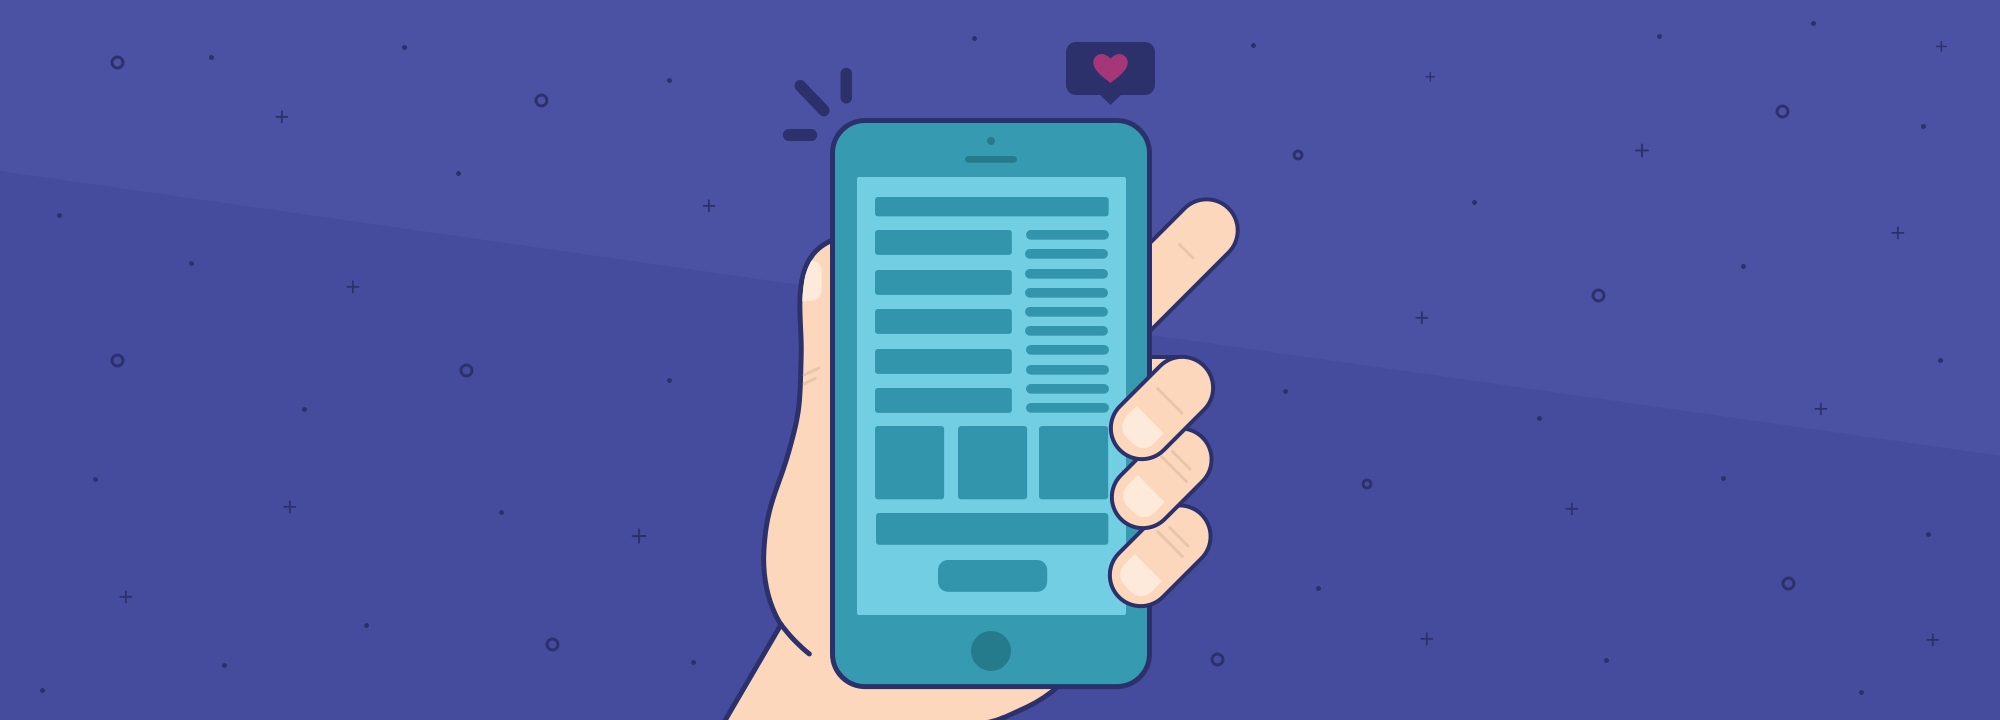 Mobile App Analytics: 10 Metrics to Measure User Engagement